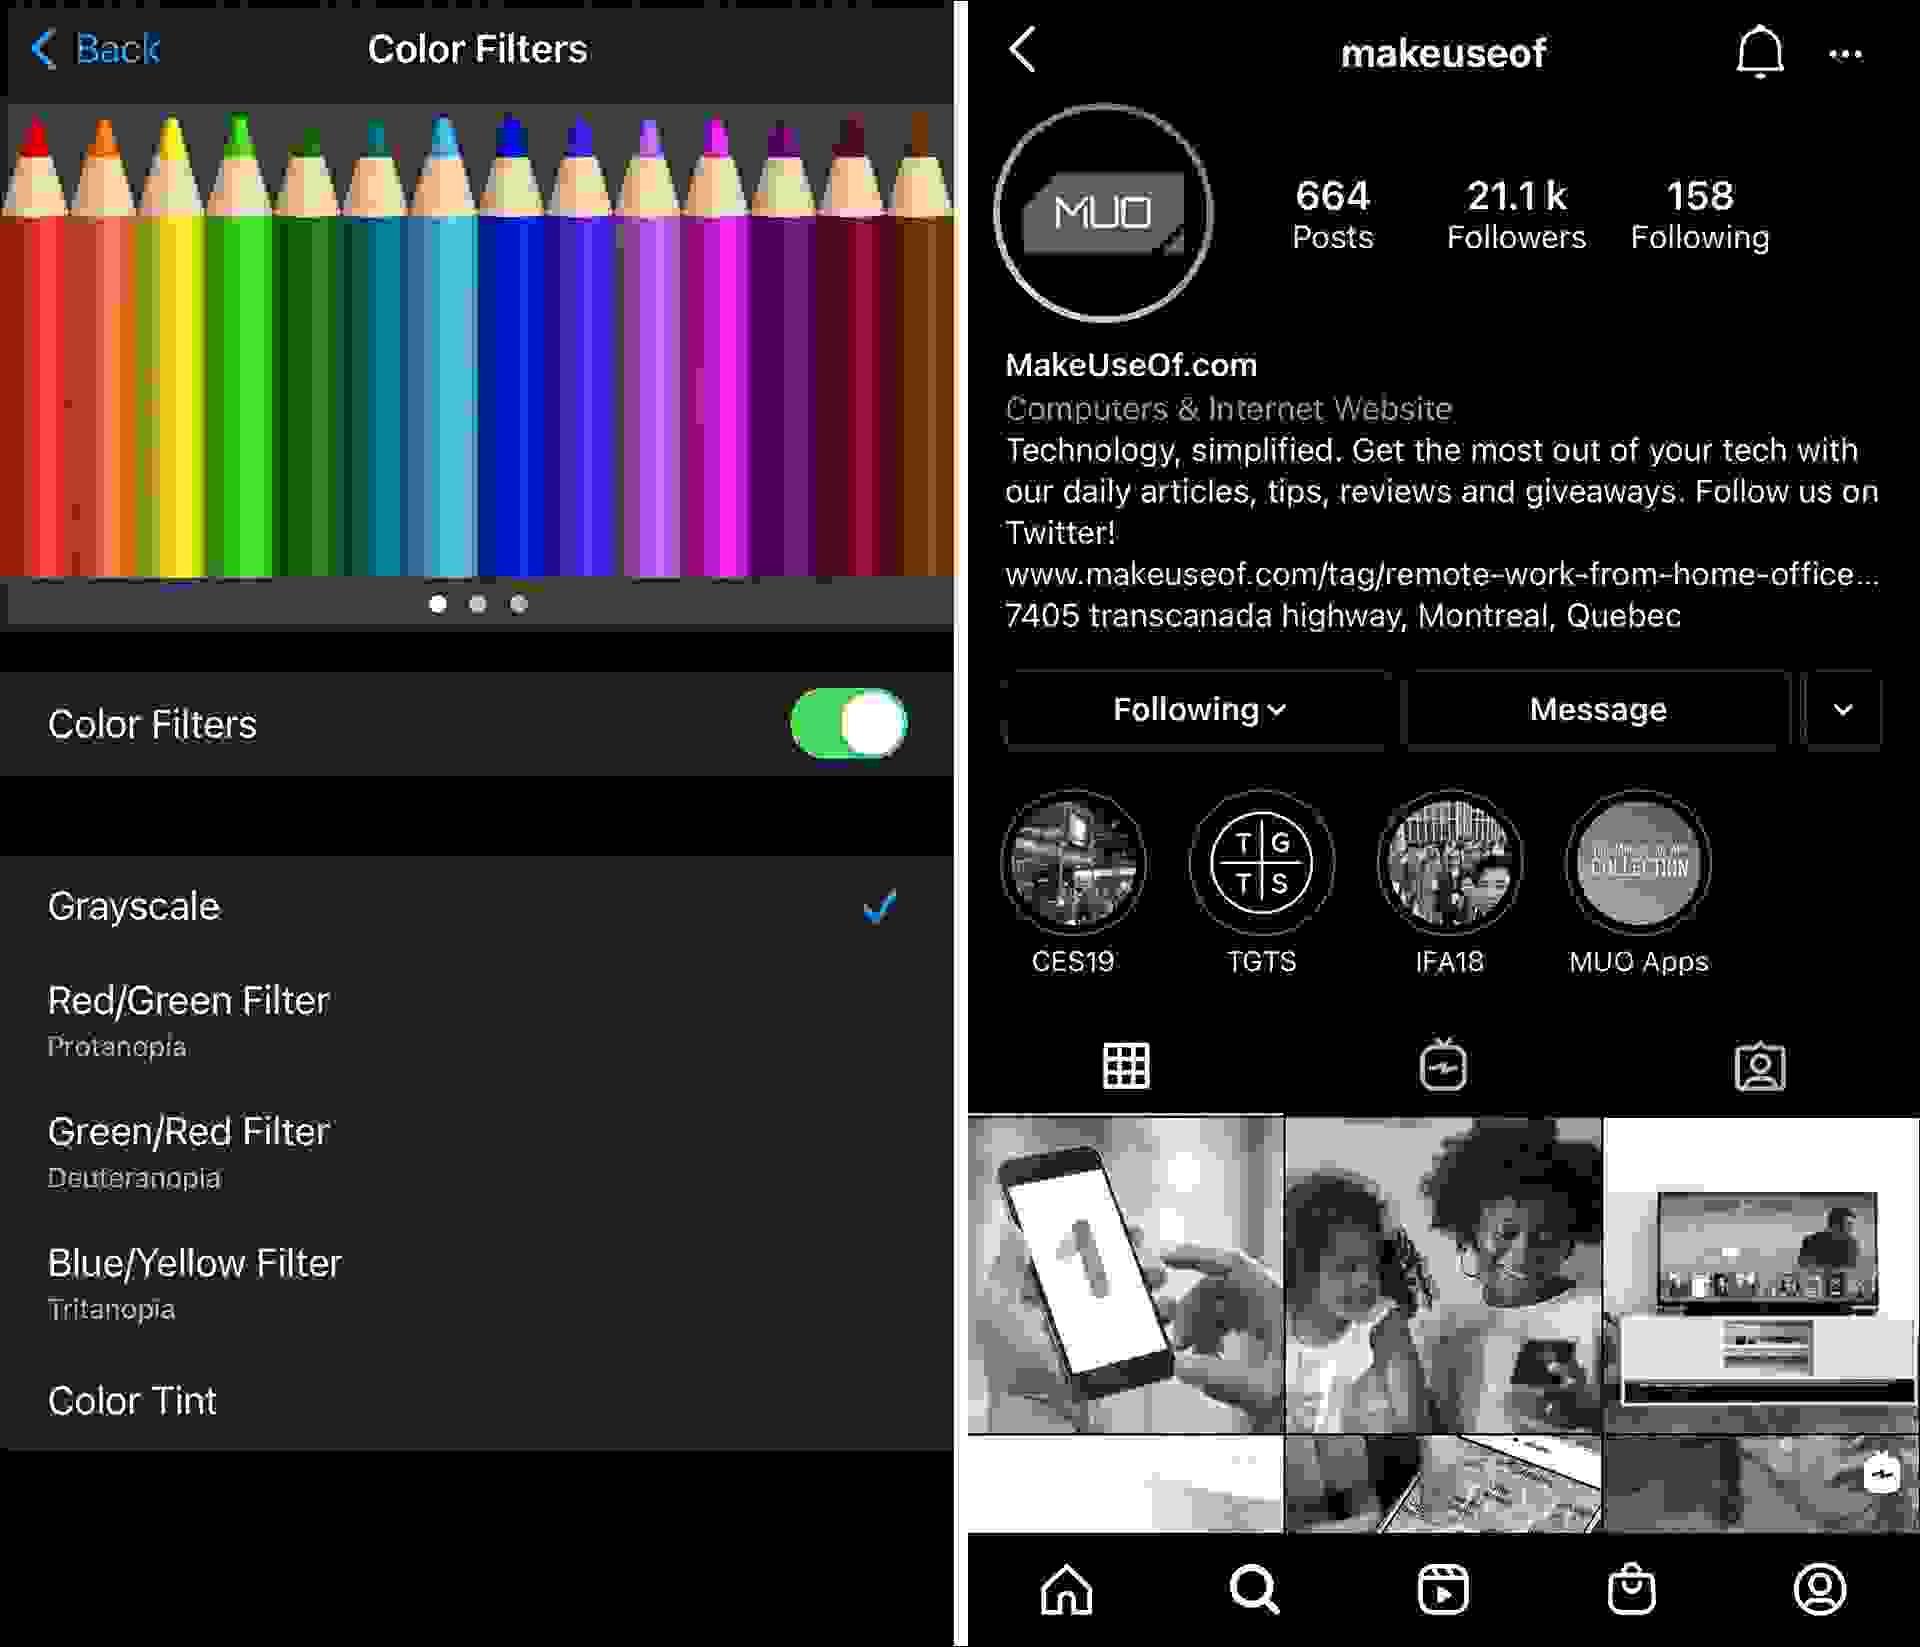 فلاتر الألوان (Color Filters)